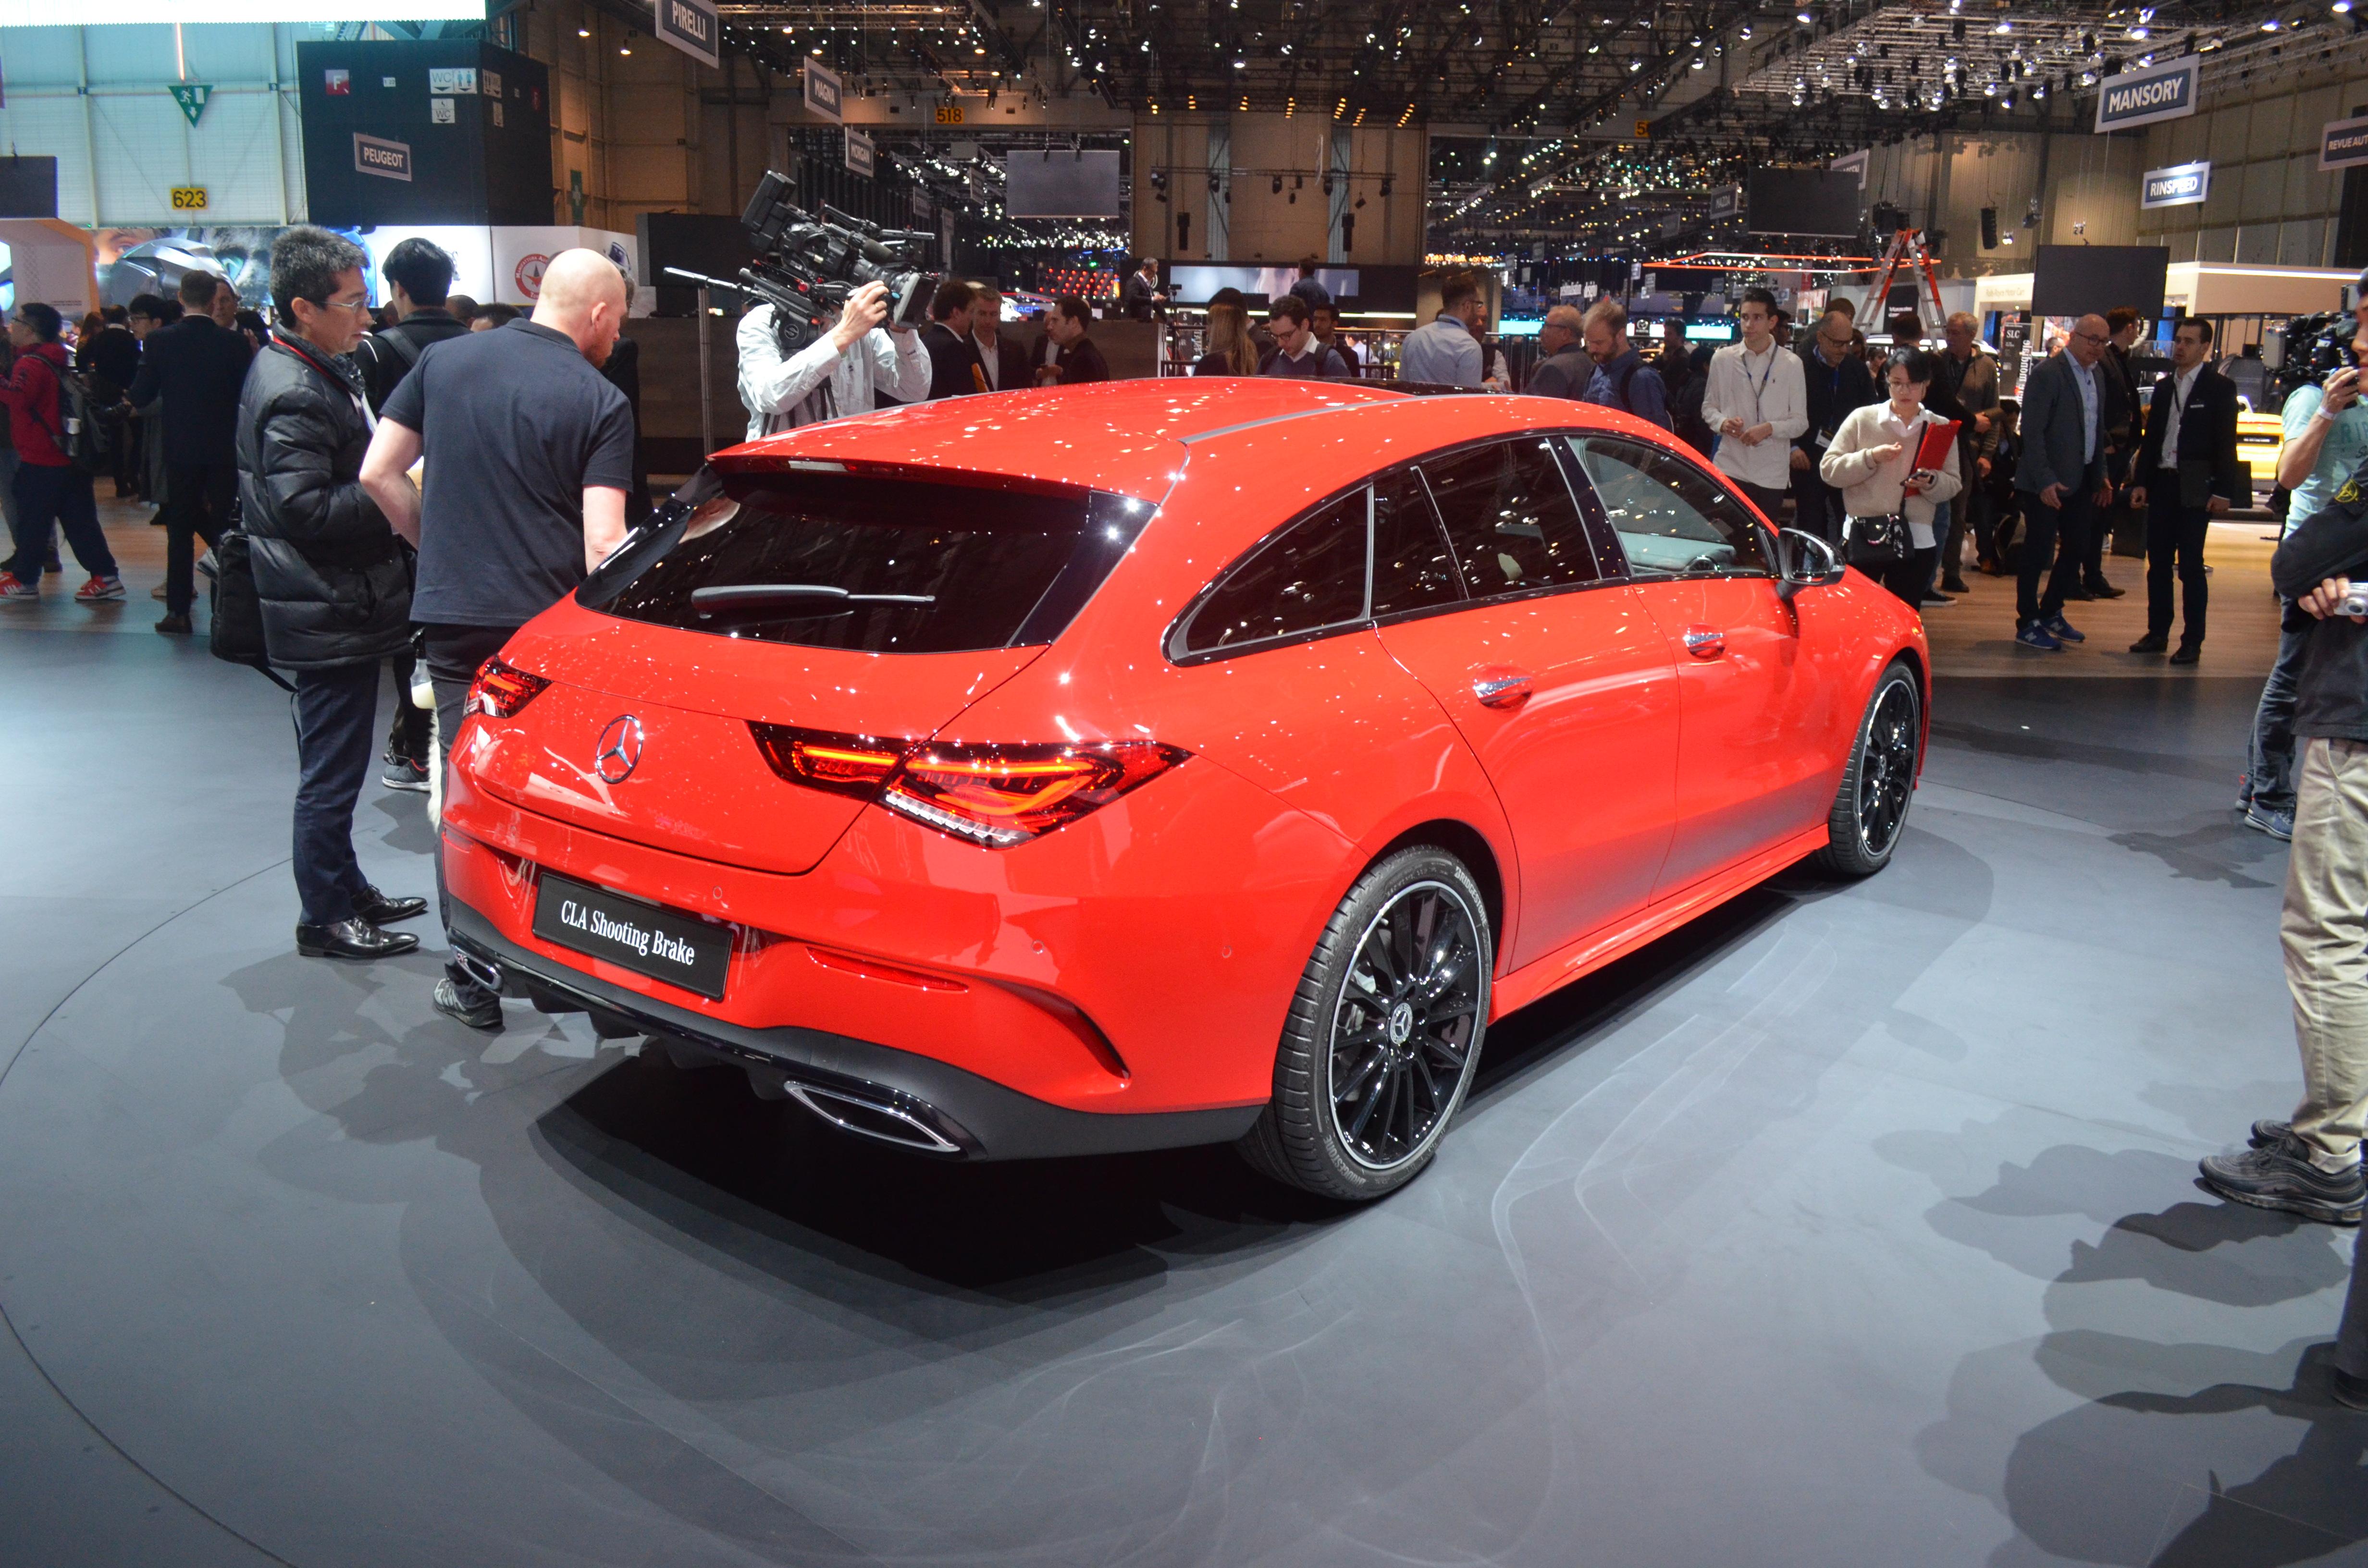 posteriore-mercedes-cla-shooting-brake-salone-ginevra-2019